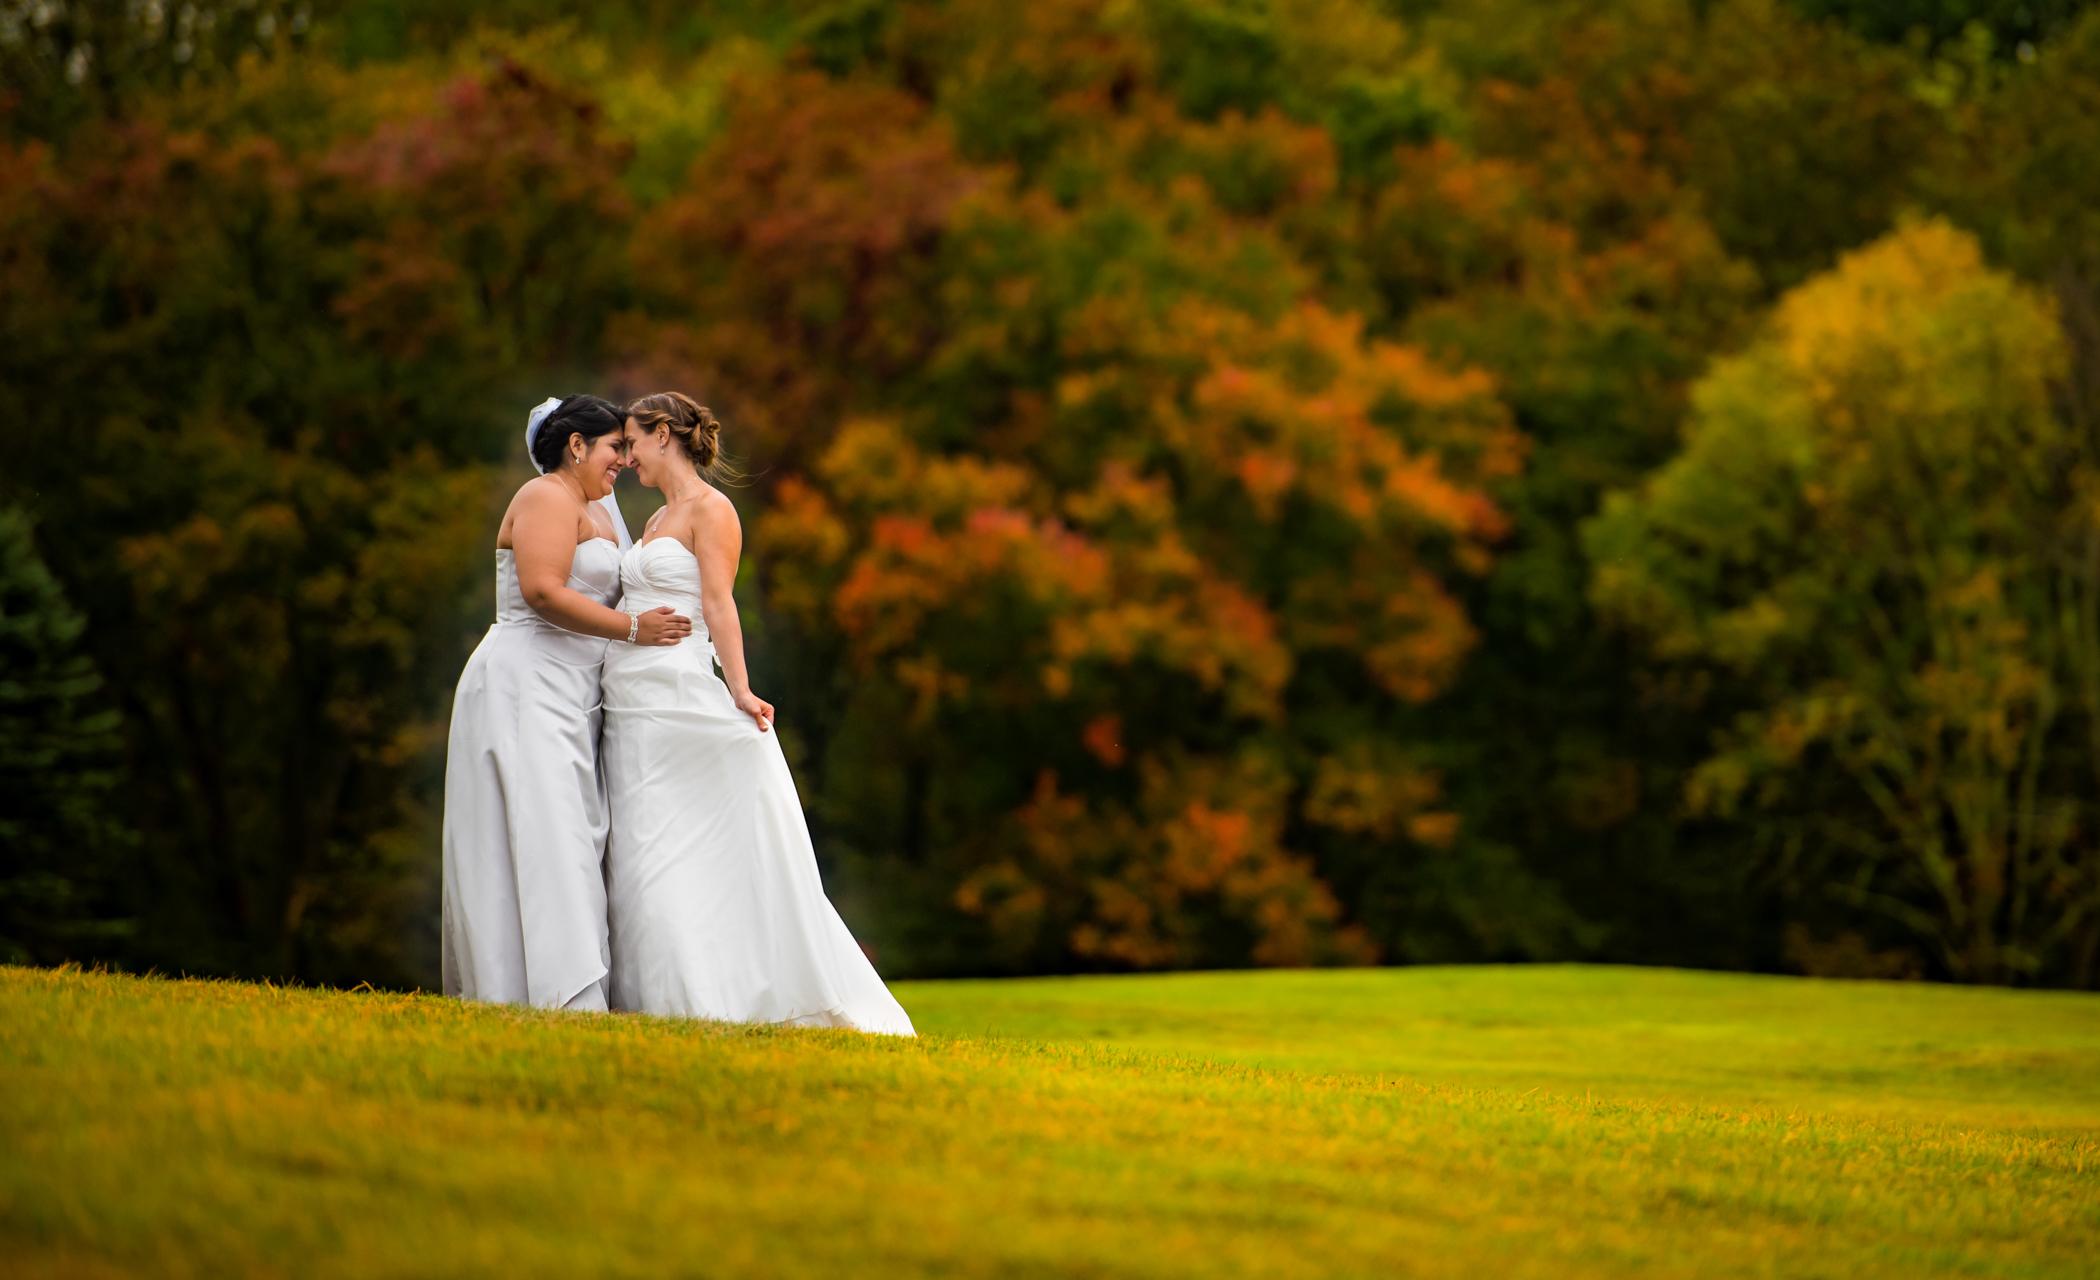 connecticut-wedding-photographers-chris-nachtwey-photography-2018-11.jpg